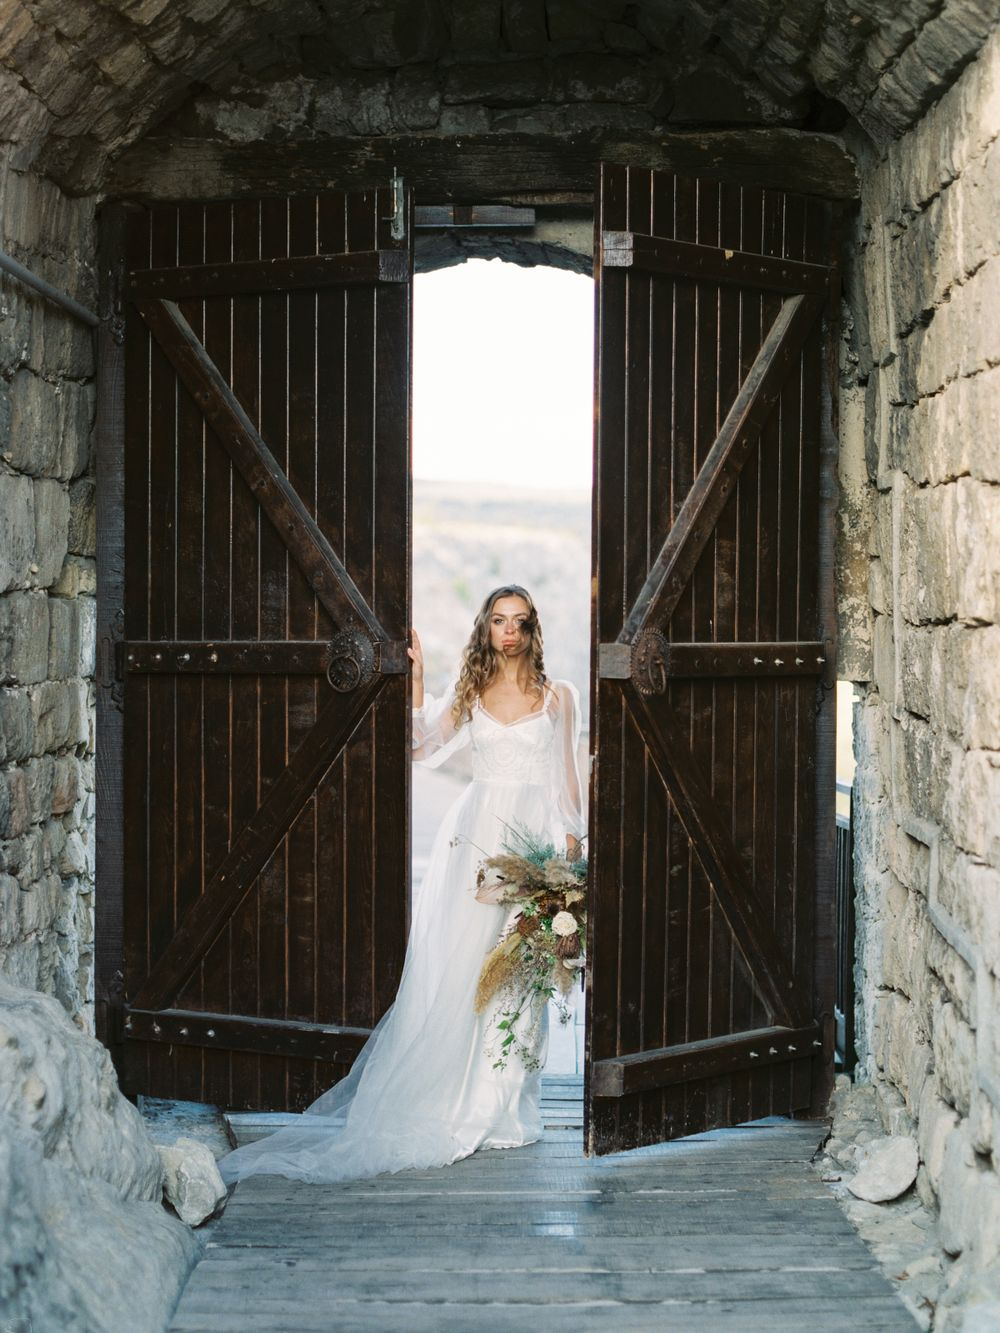 Julia Marynova photo